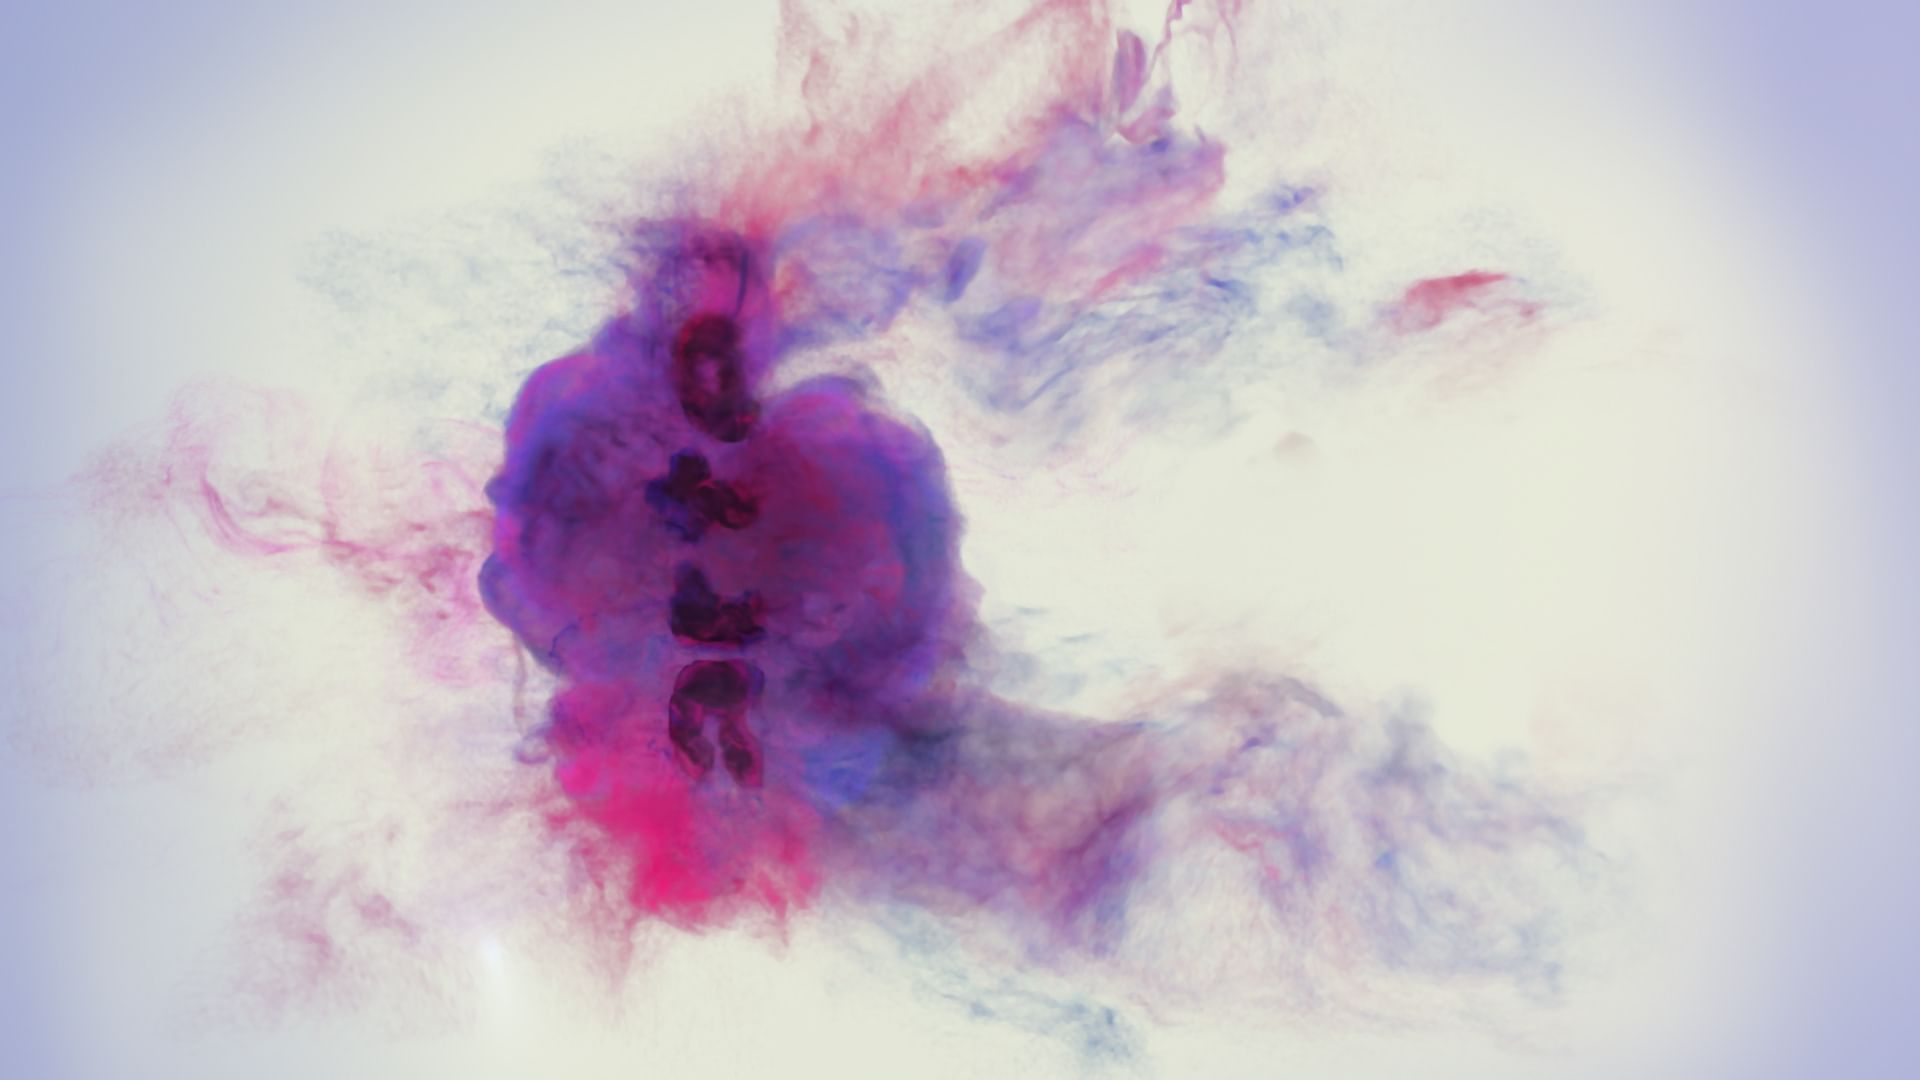 BiTS - Final Fantasy